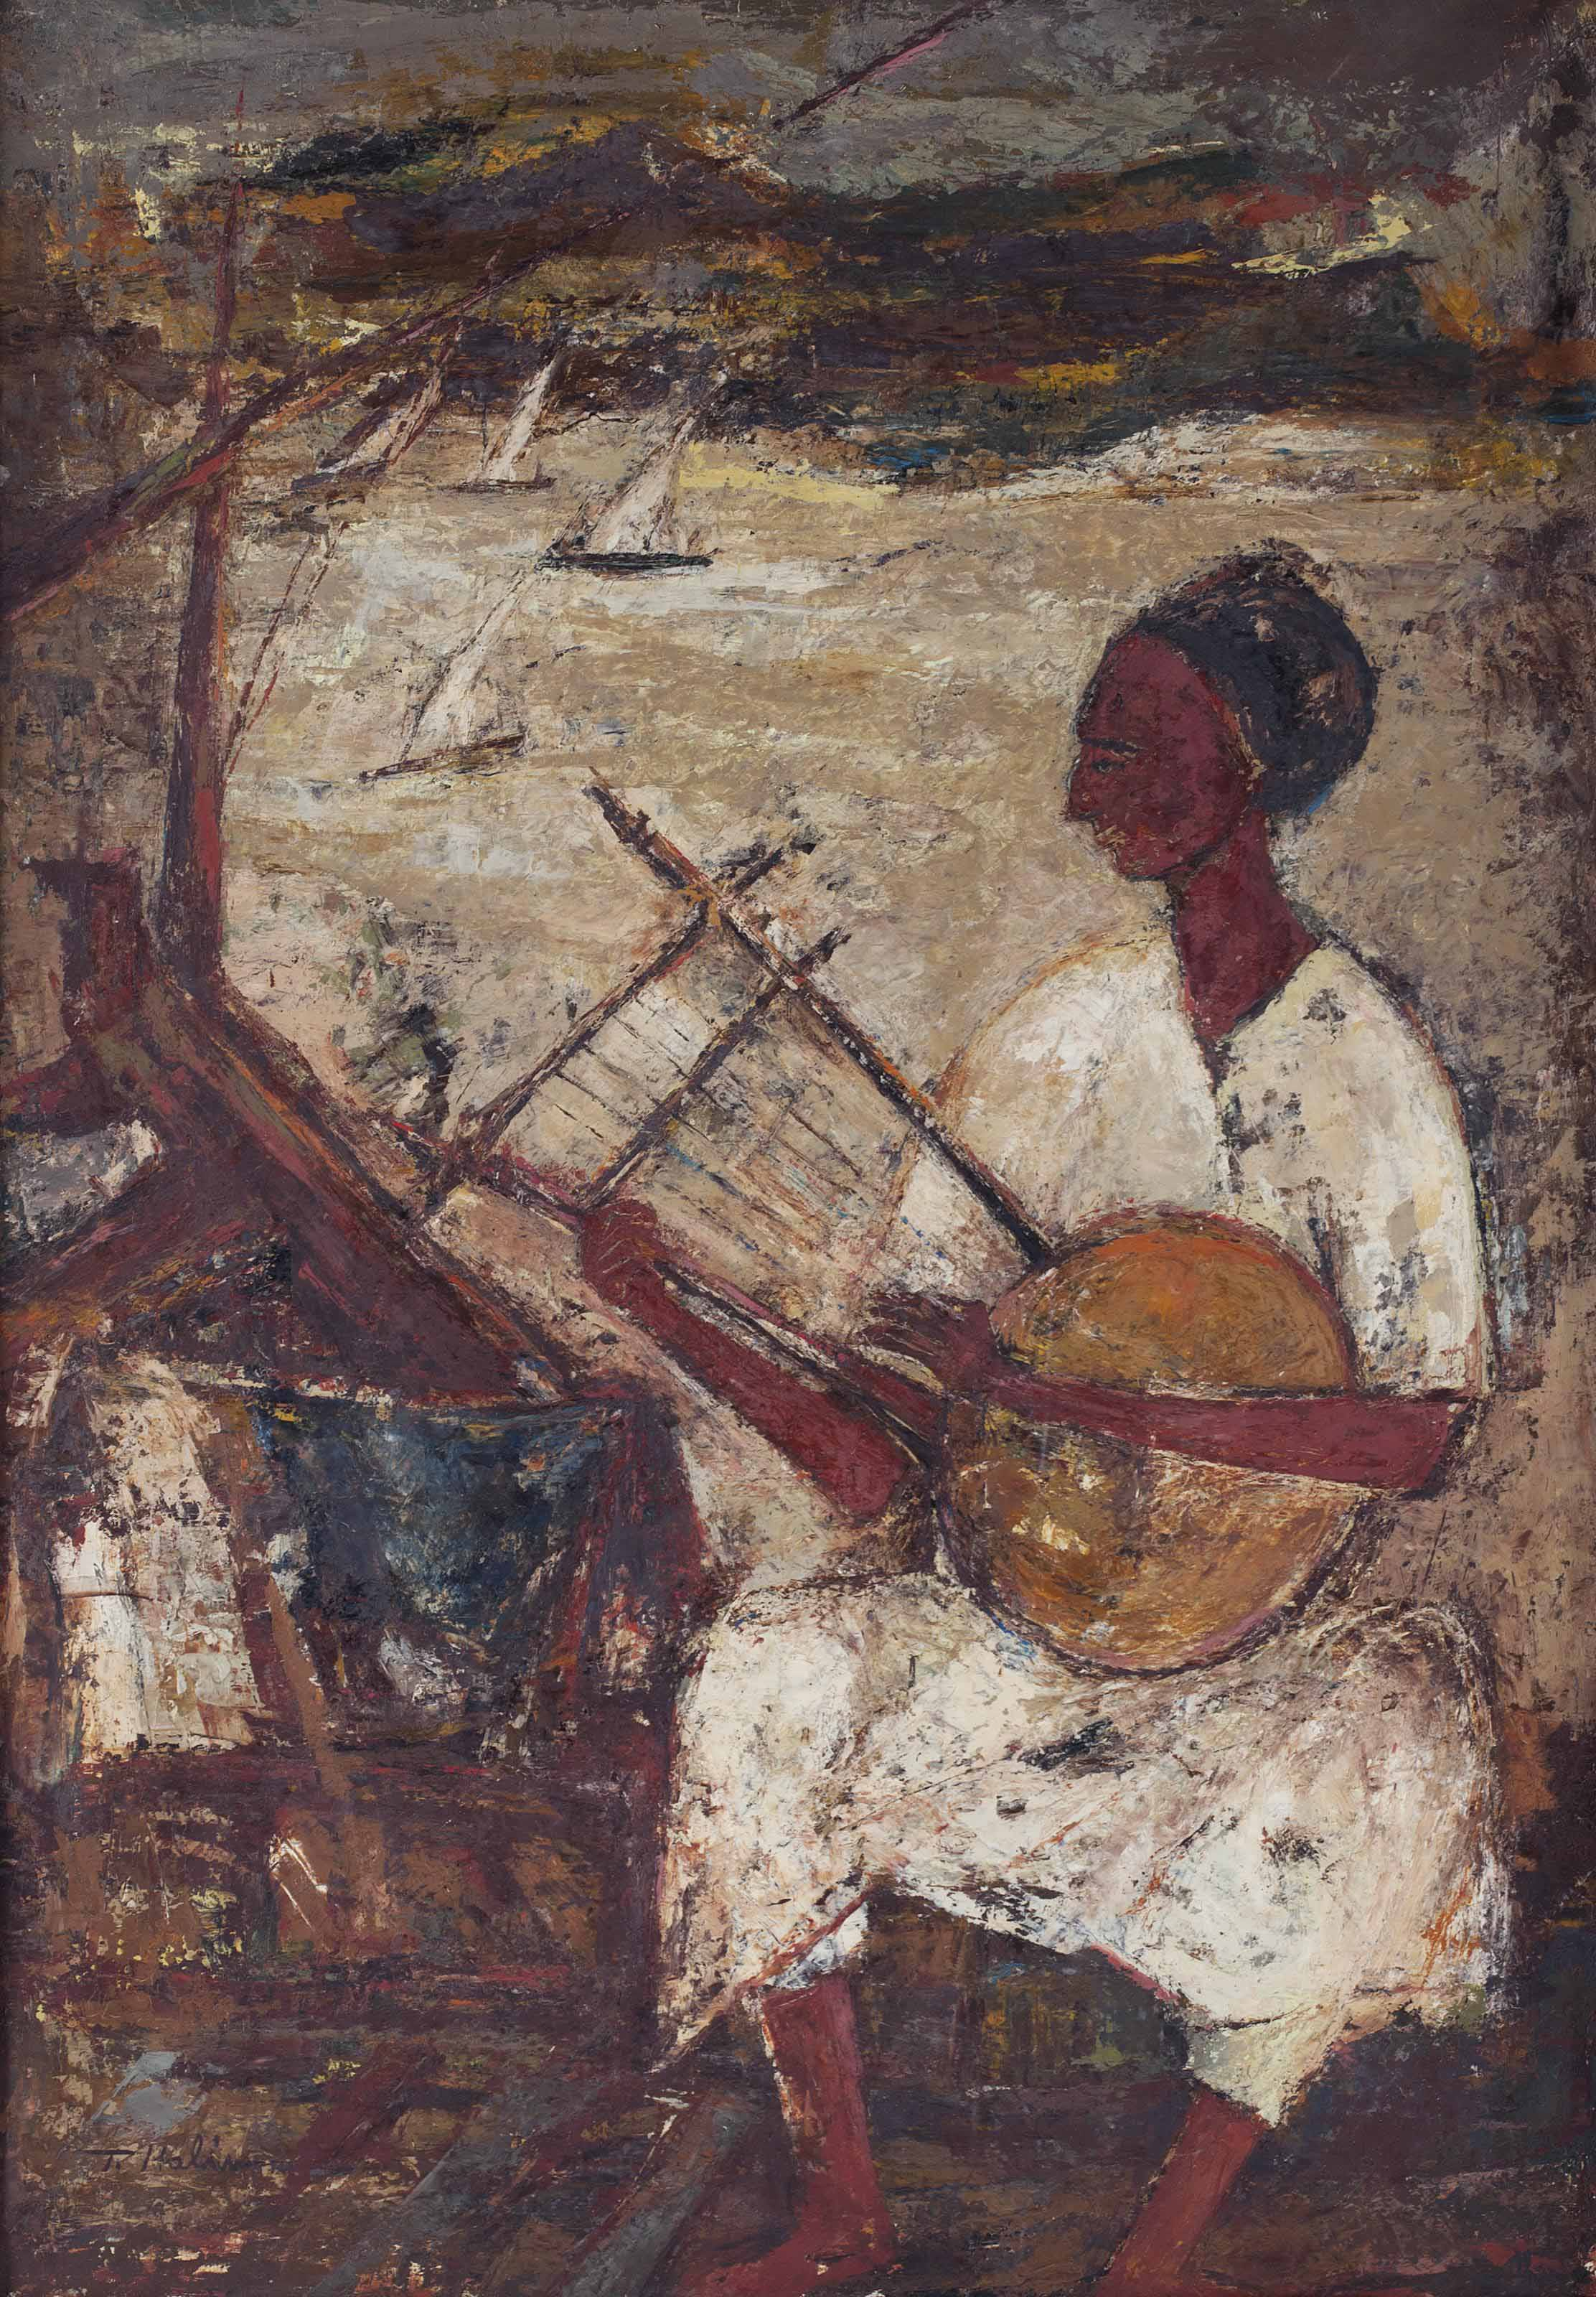 Oghniya Li Al Nil (A Song for the Nile)